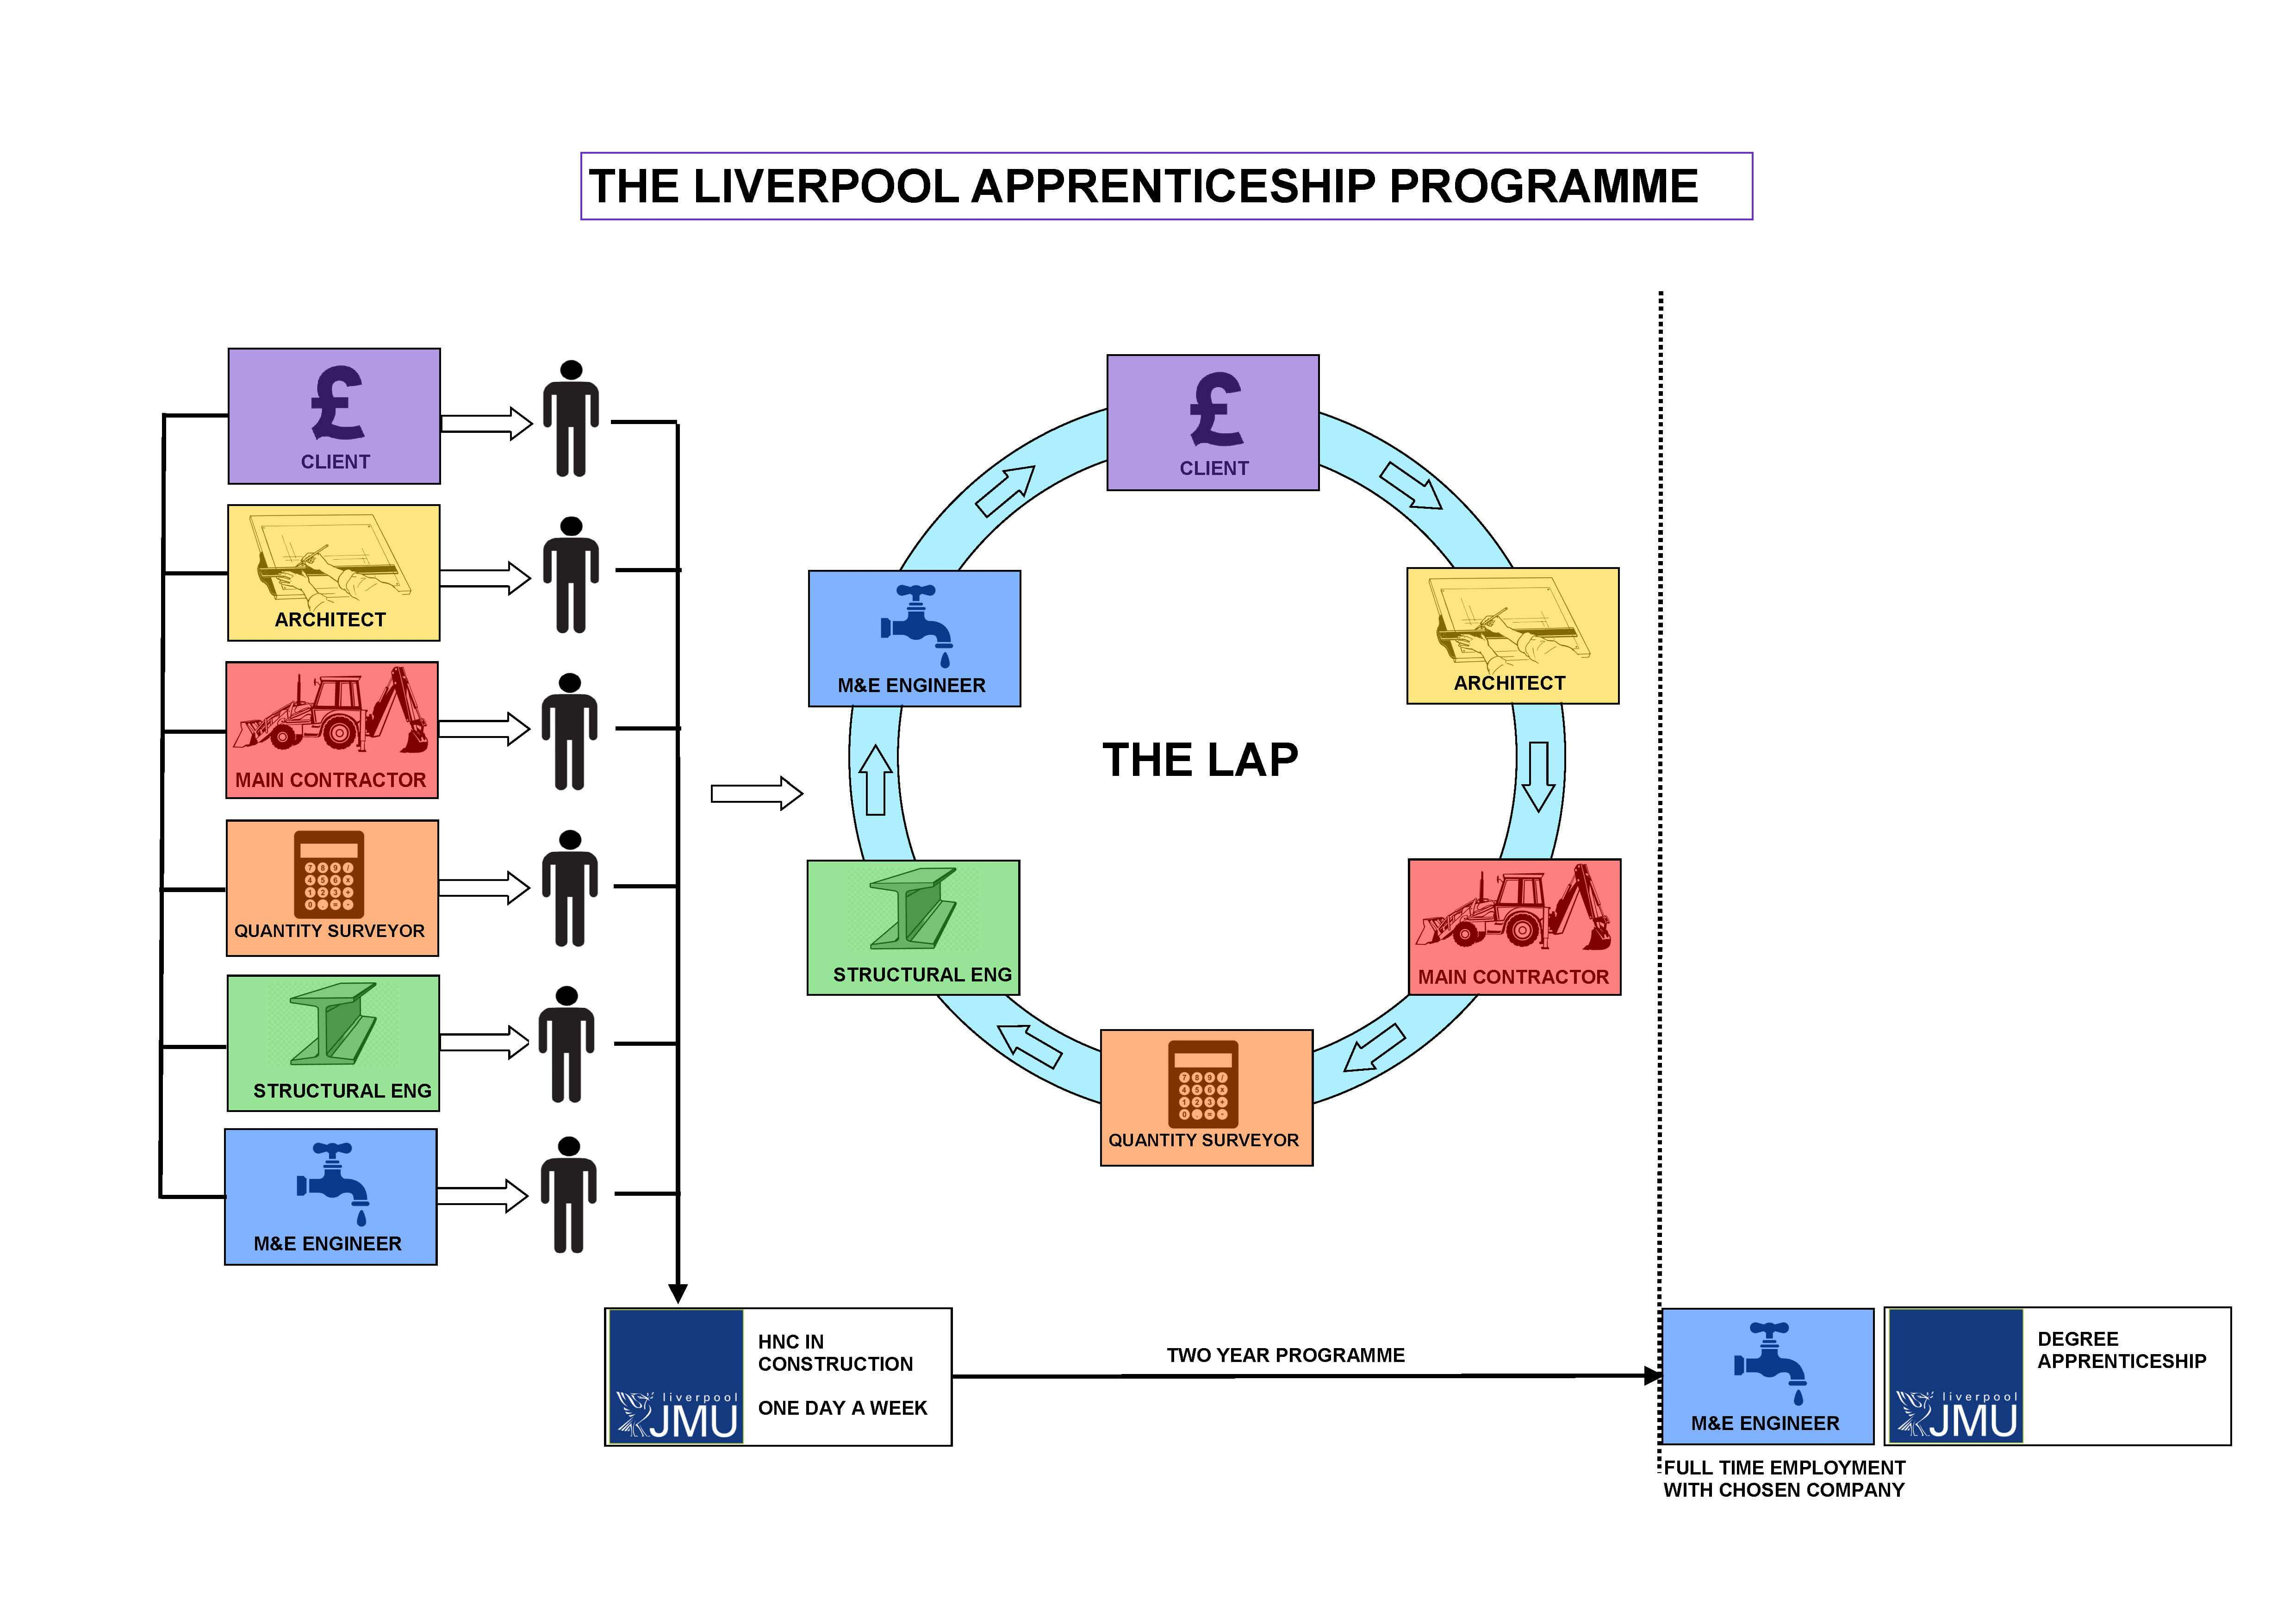 Liverpool Apprenticeship Programme Steven Hunt & Associates